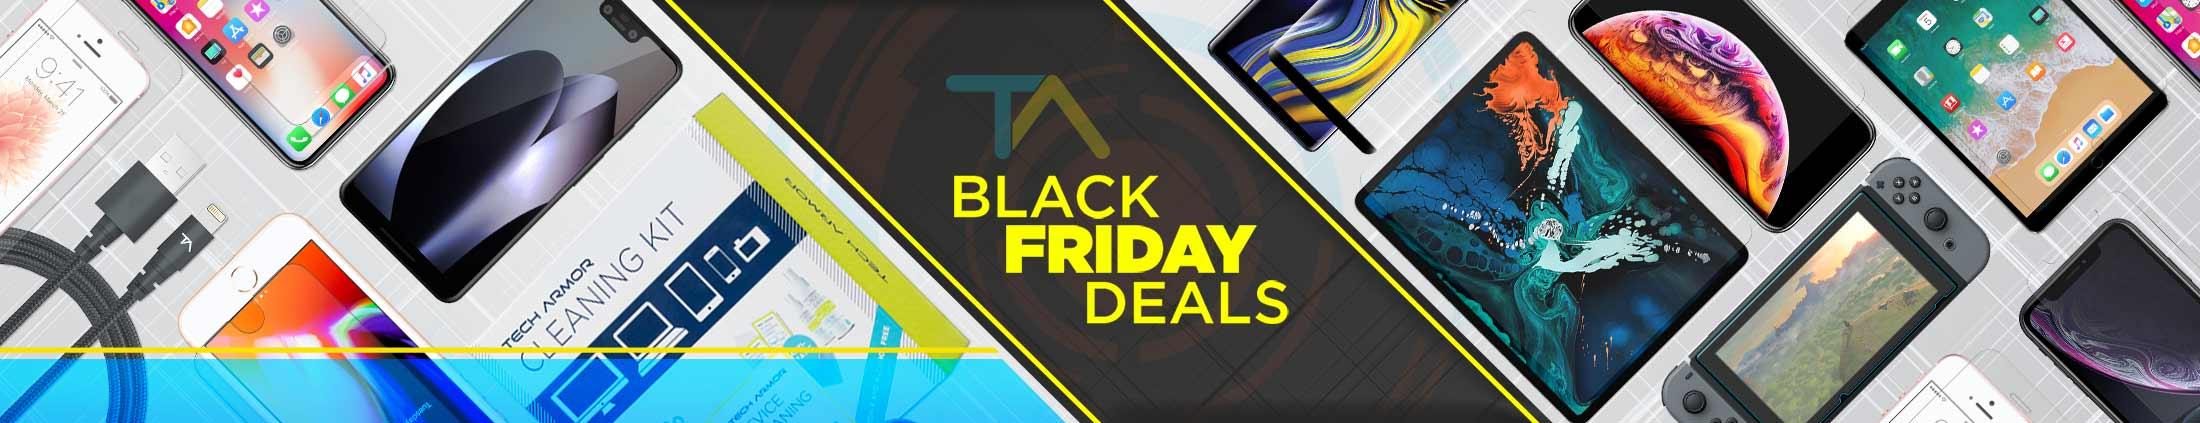 Tech Armor Black Friday Deals